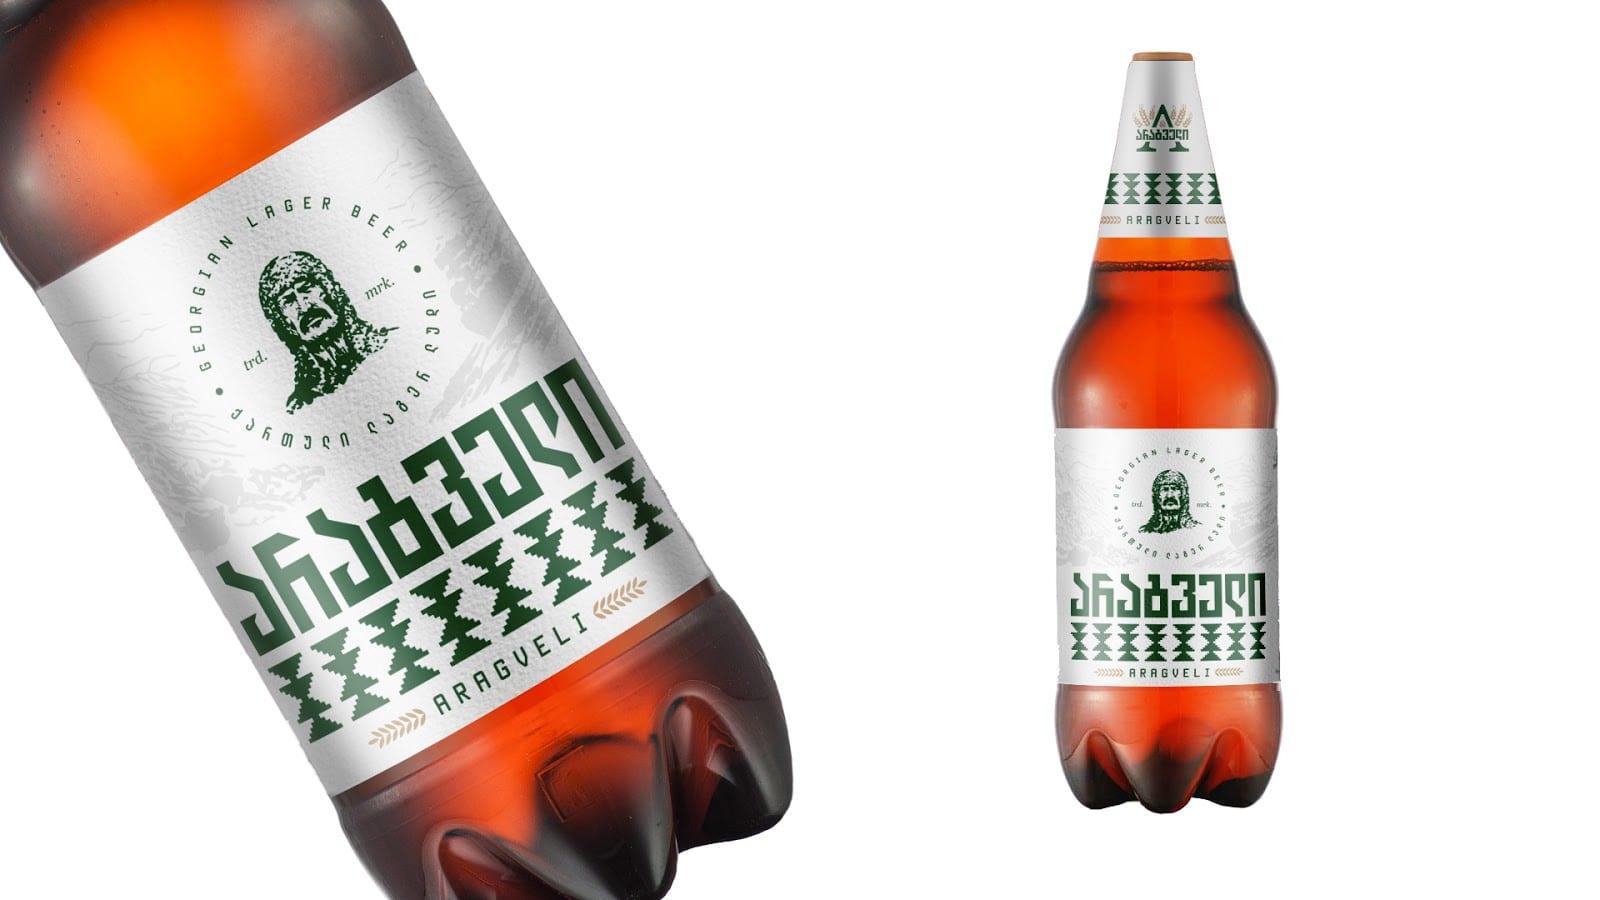 9 Simulation - Odvážná podoba piva Aragveli